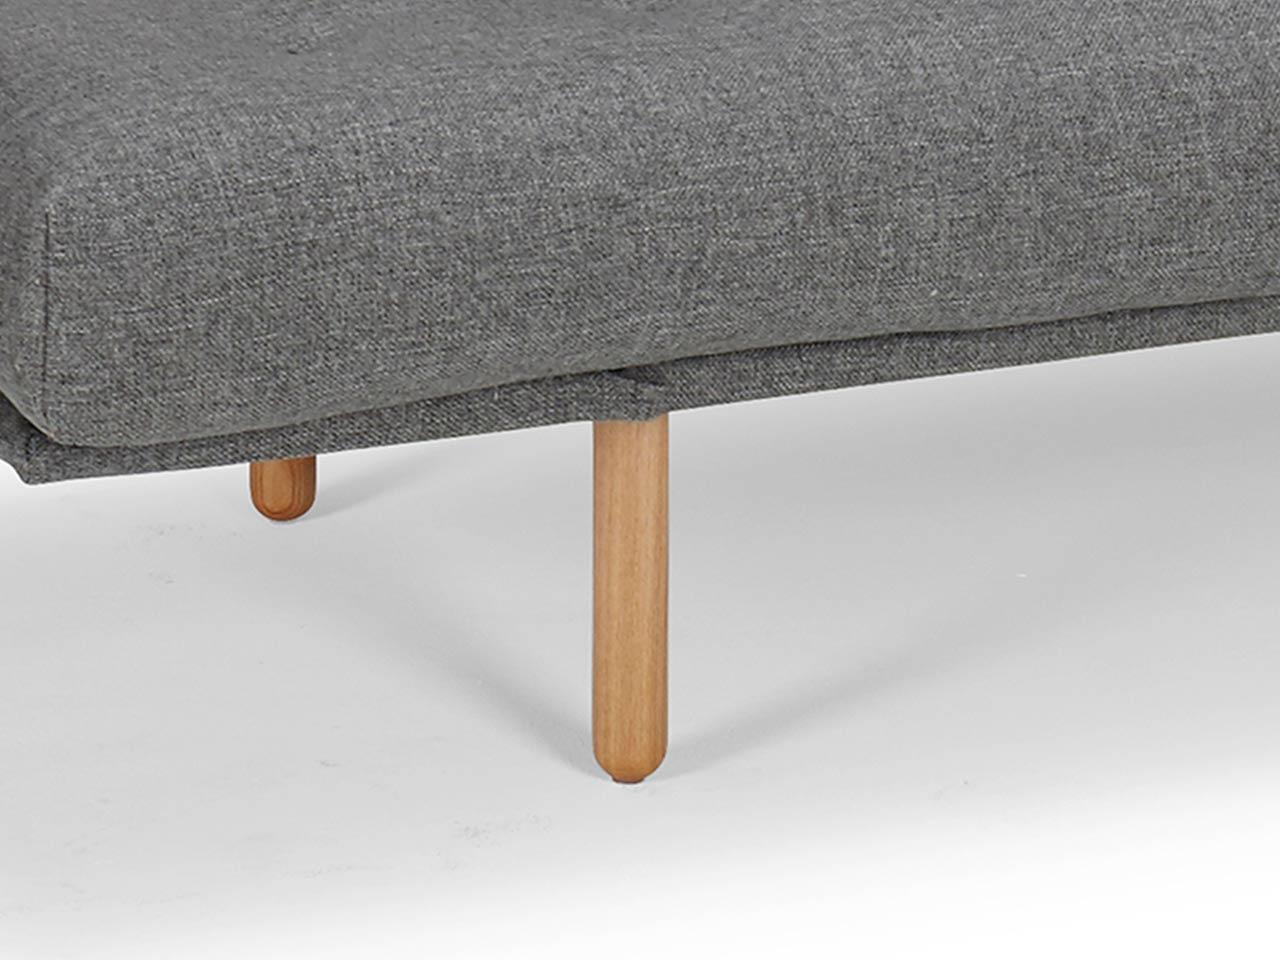 rollo schlafsofa von innovation. Black Bedroom Furniture Sets. Home Design Ideas